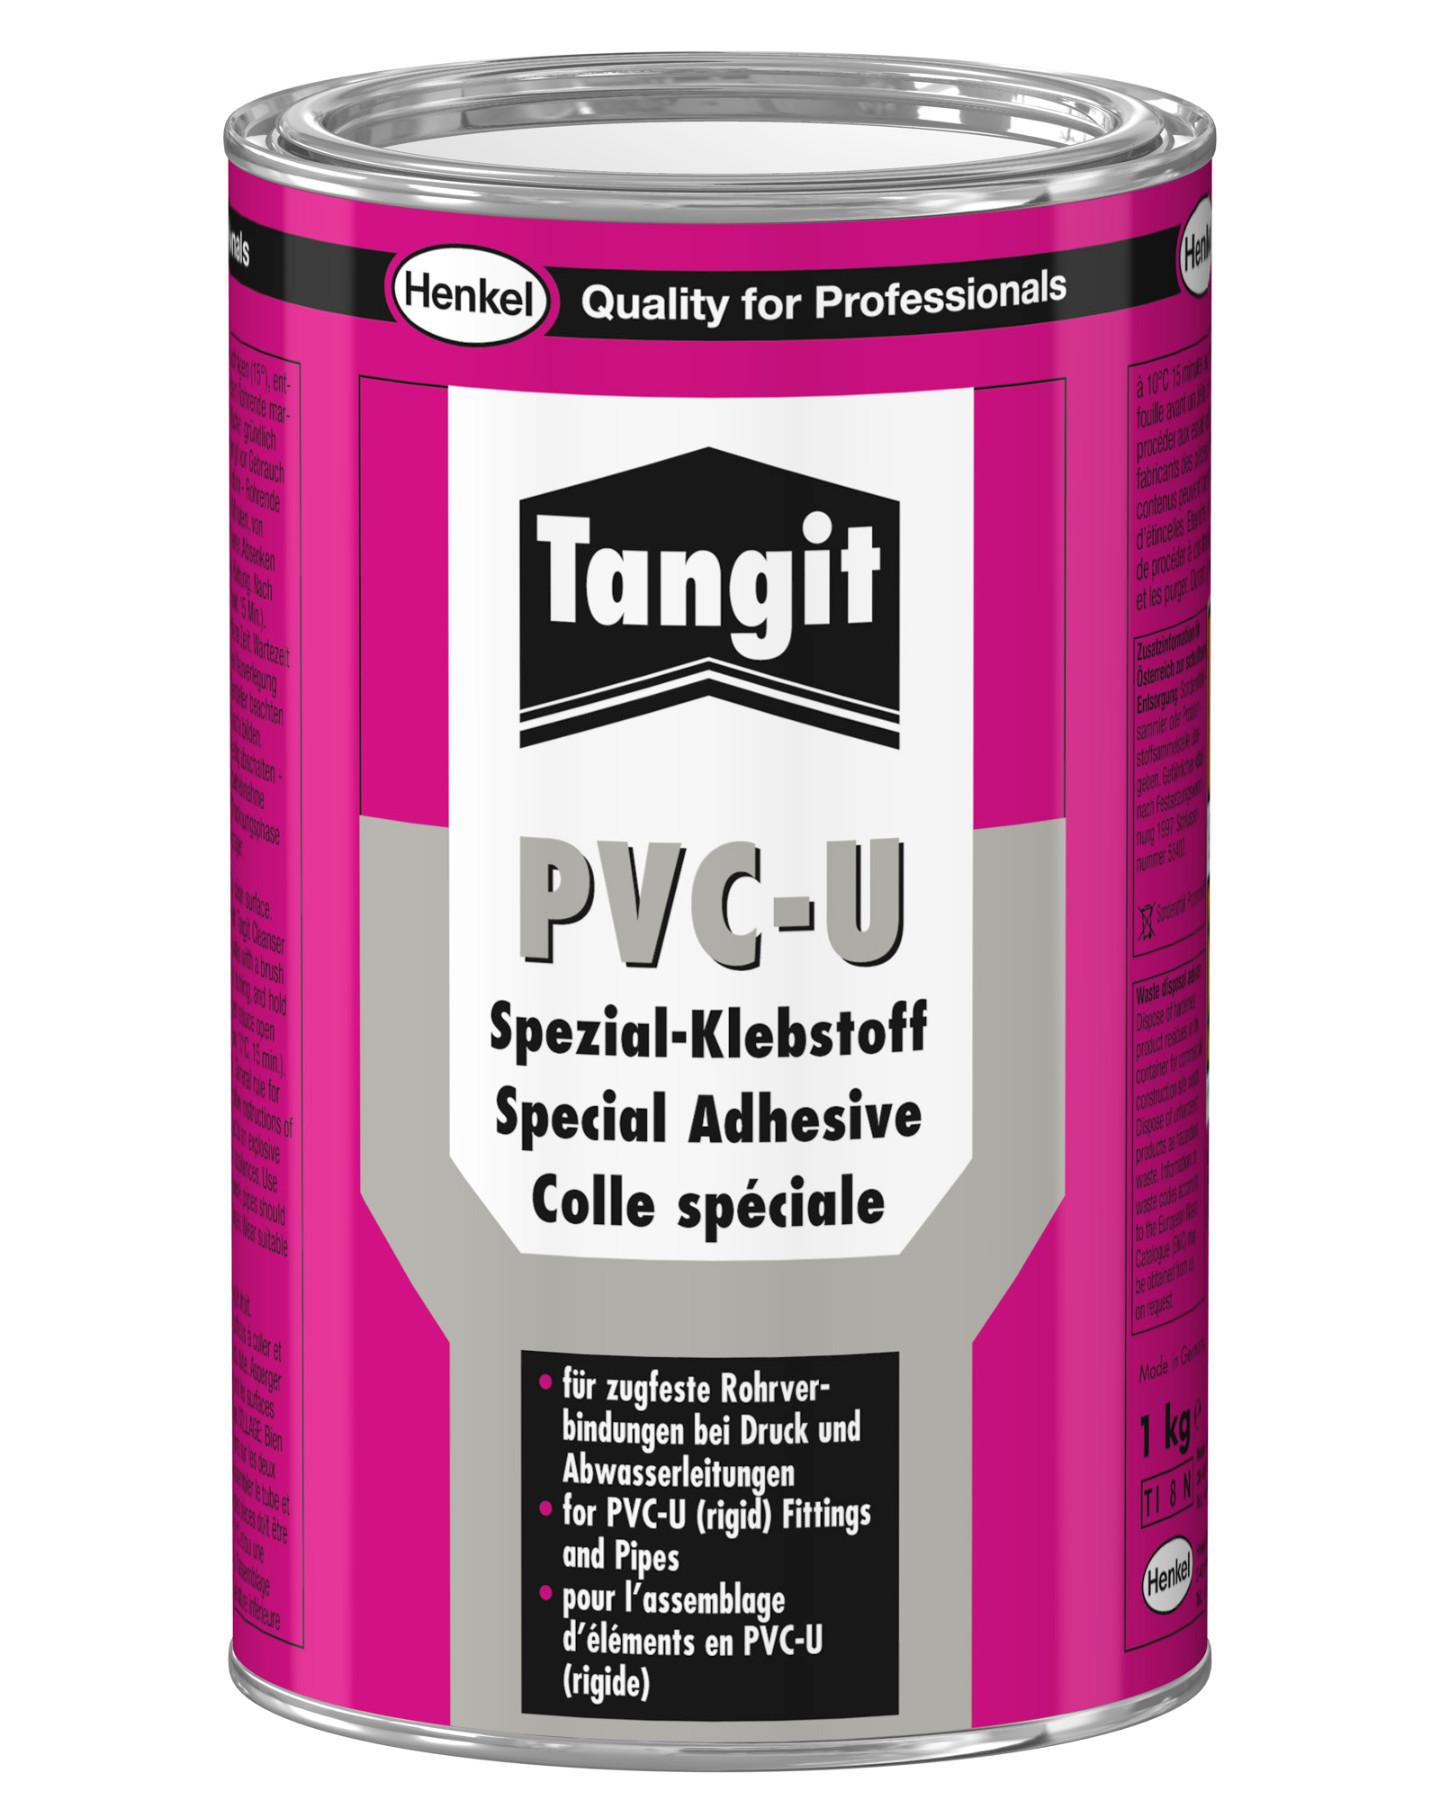 Tangit PVC-U Klebstoff 500g Dose